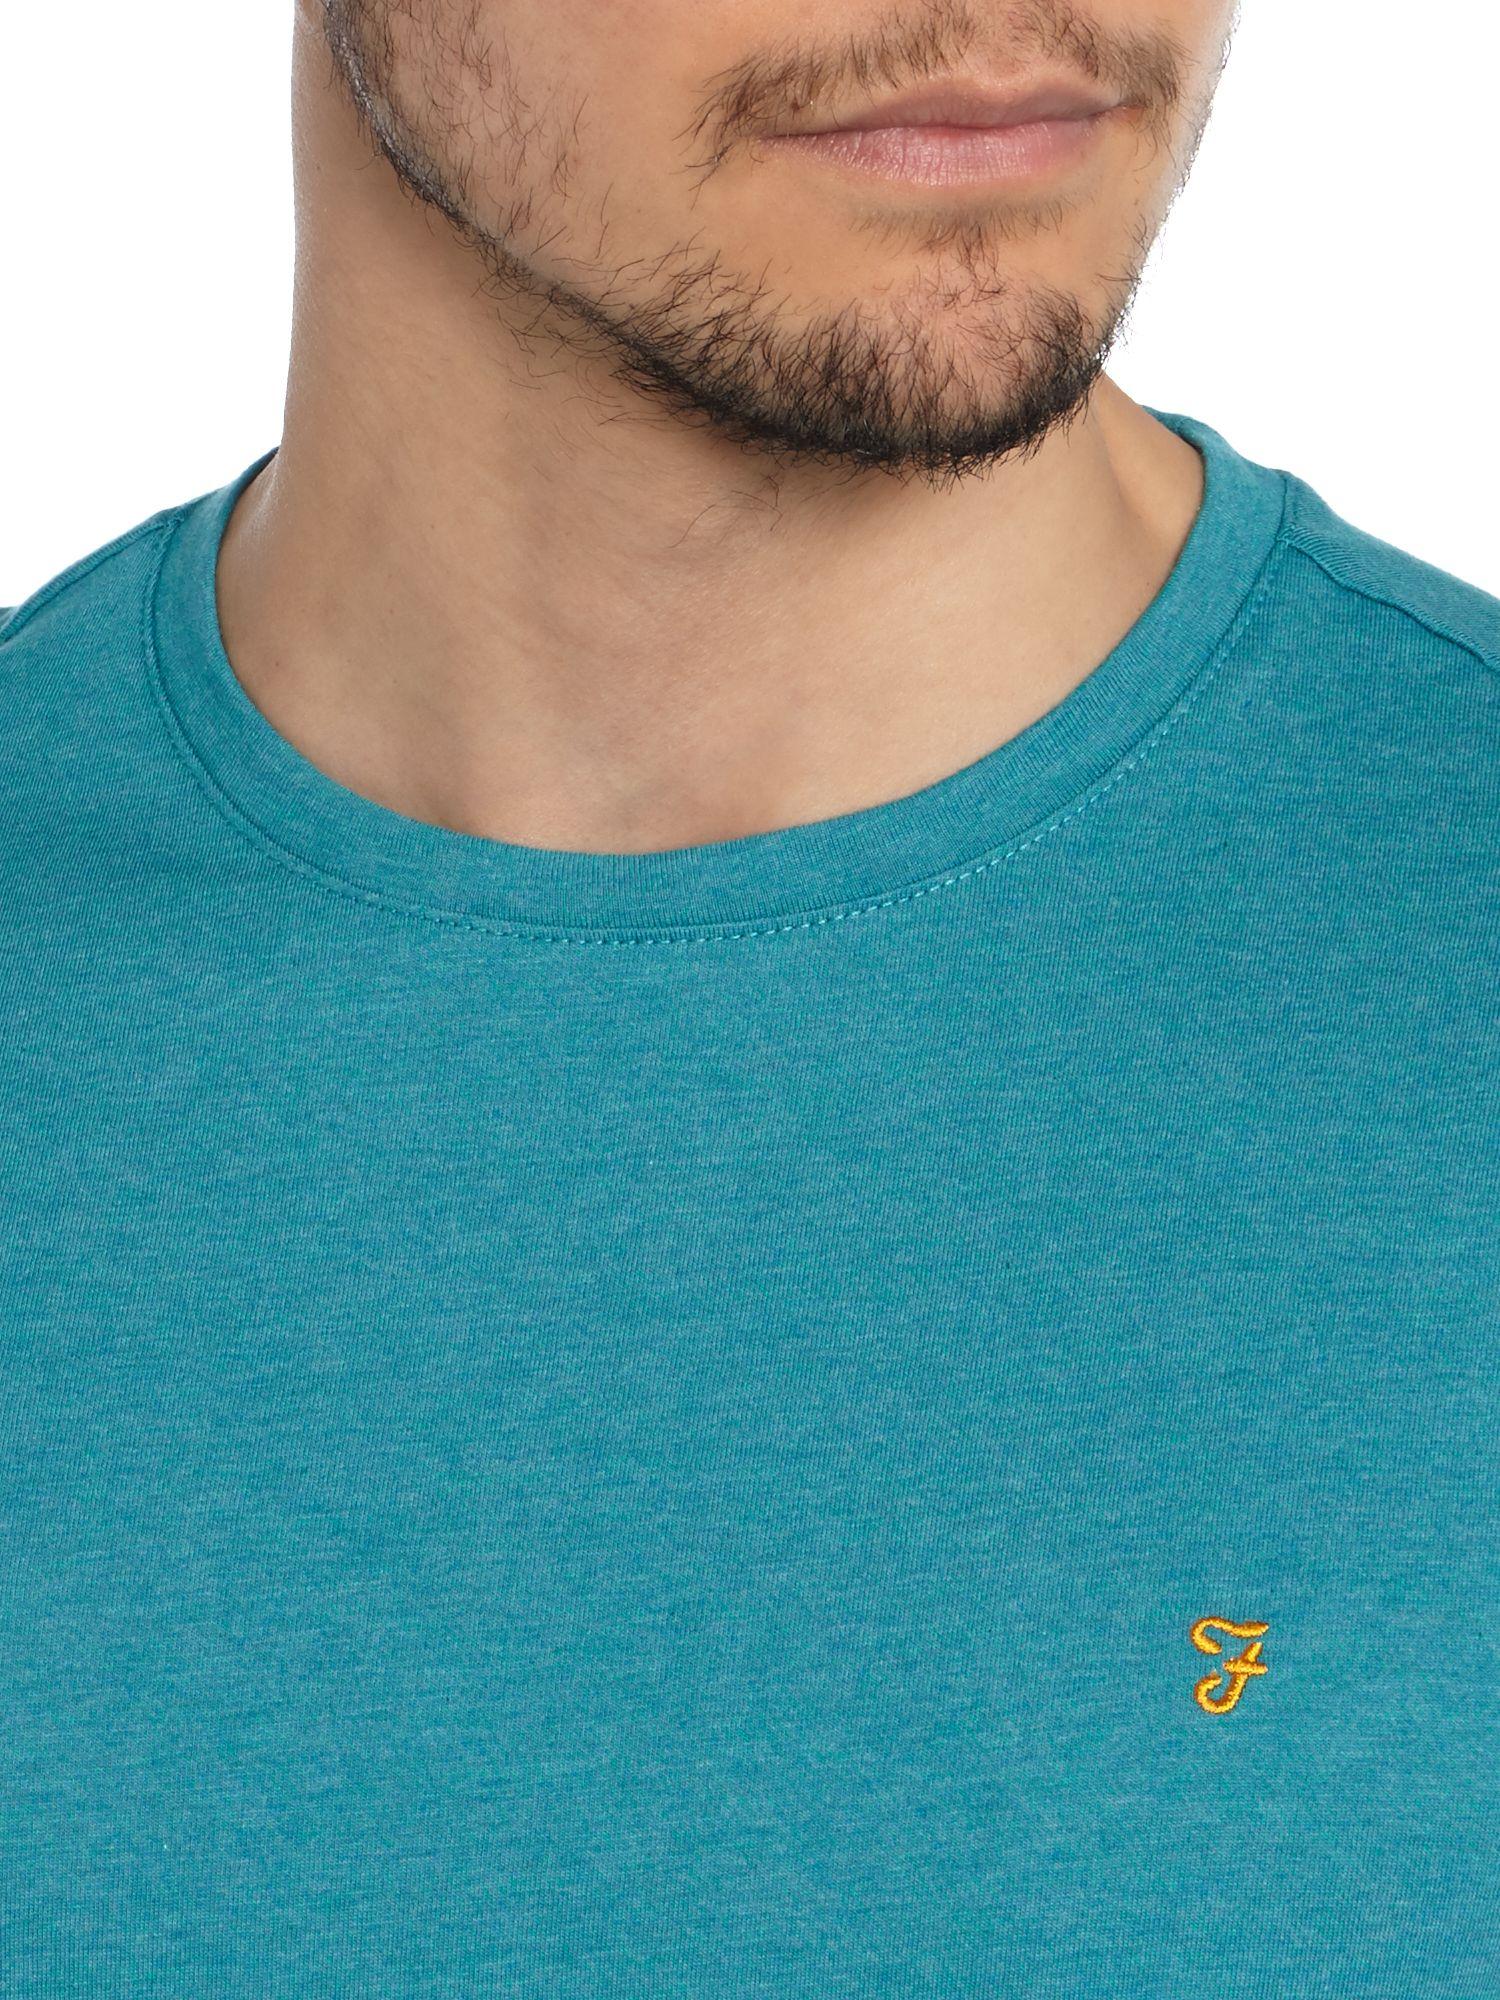 Kenyon Long Sleeve Shirts